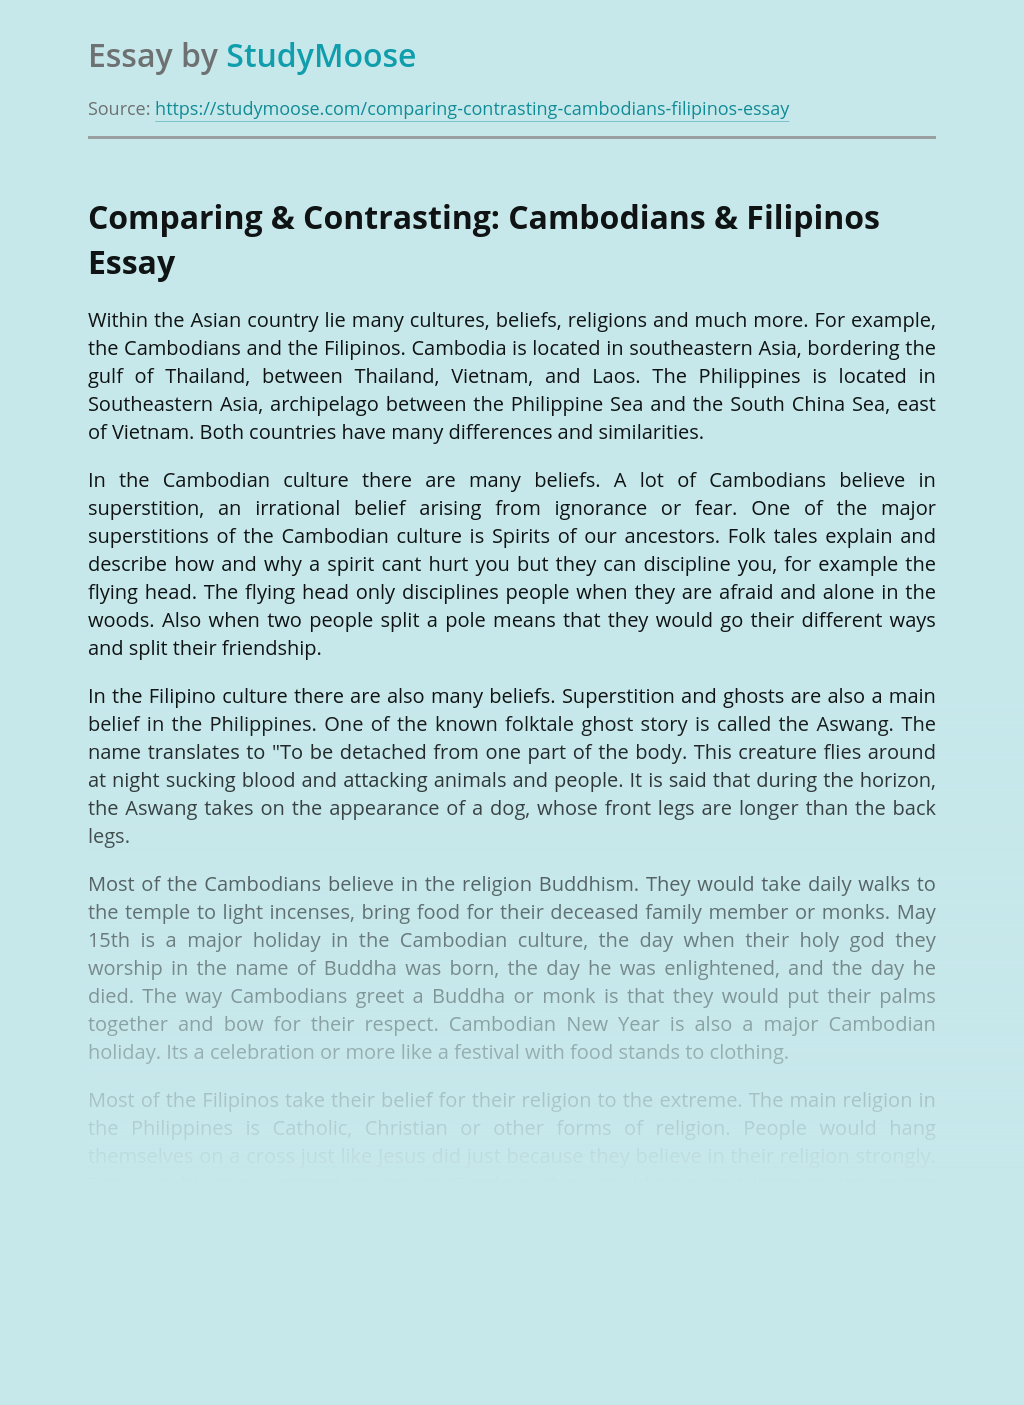 Comparing & Contrasting: Cambodians & Filipinos